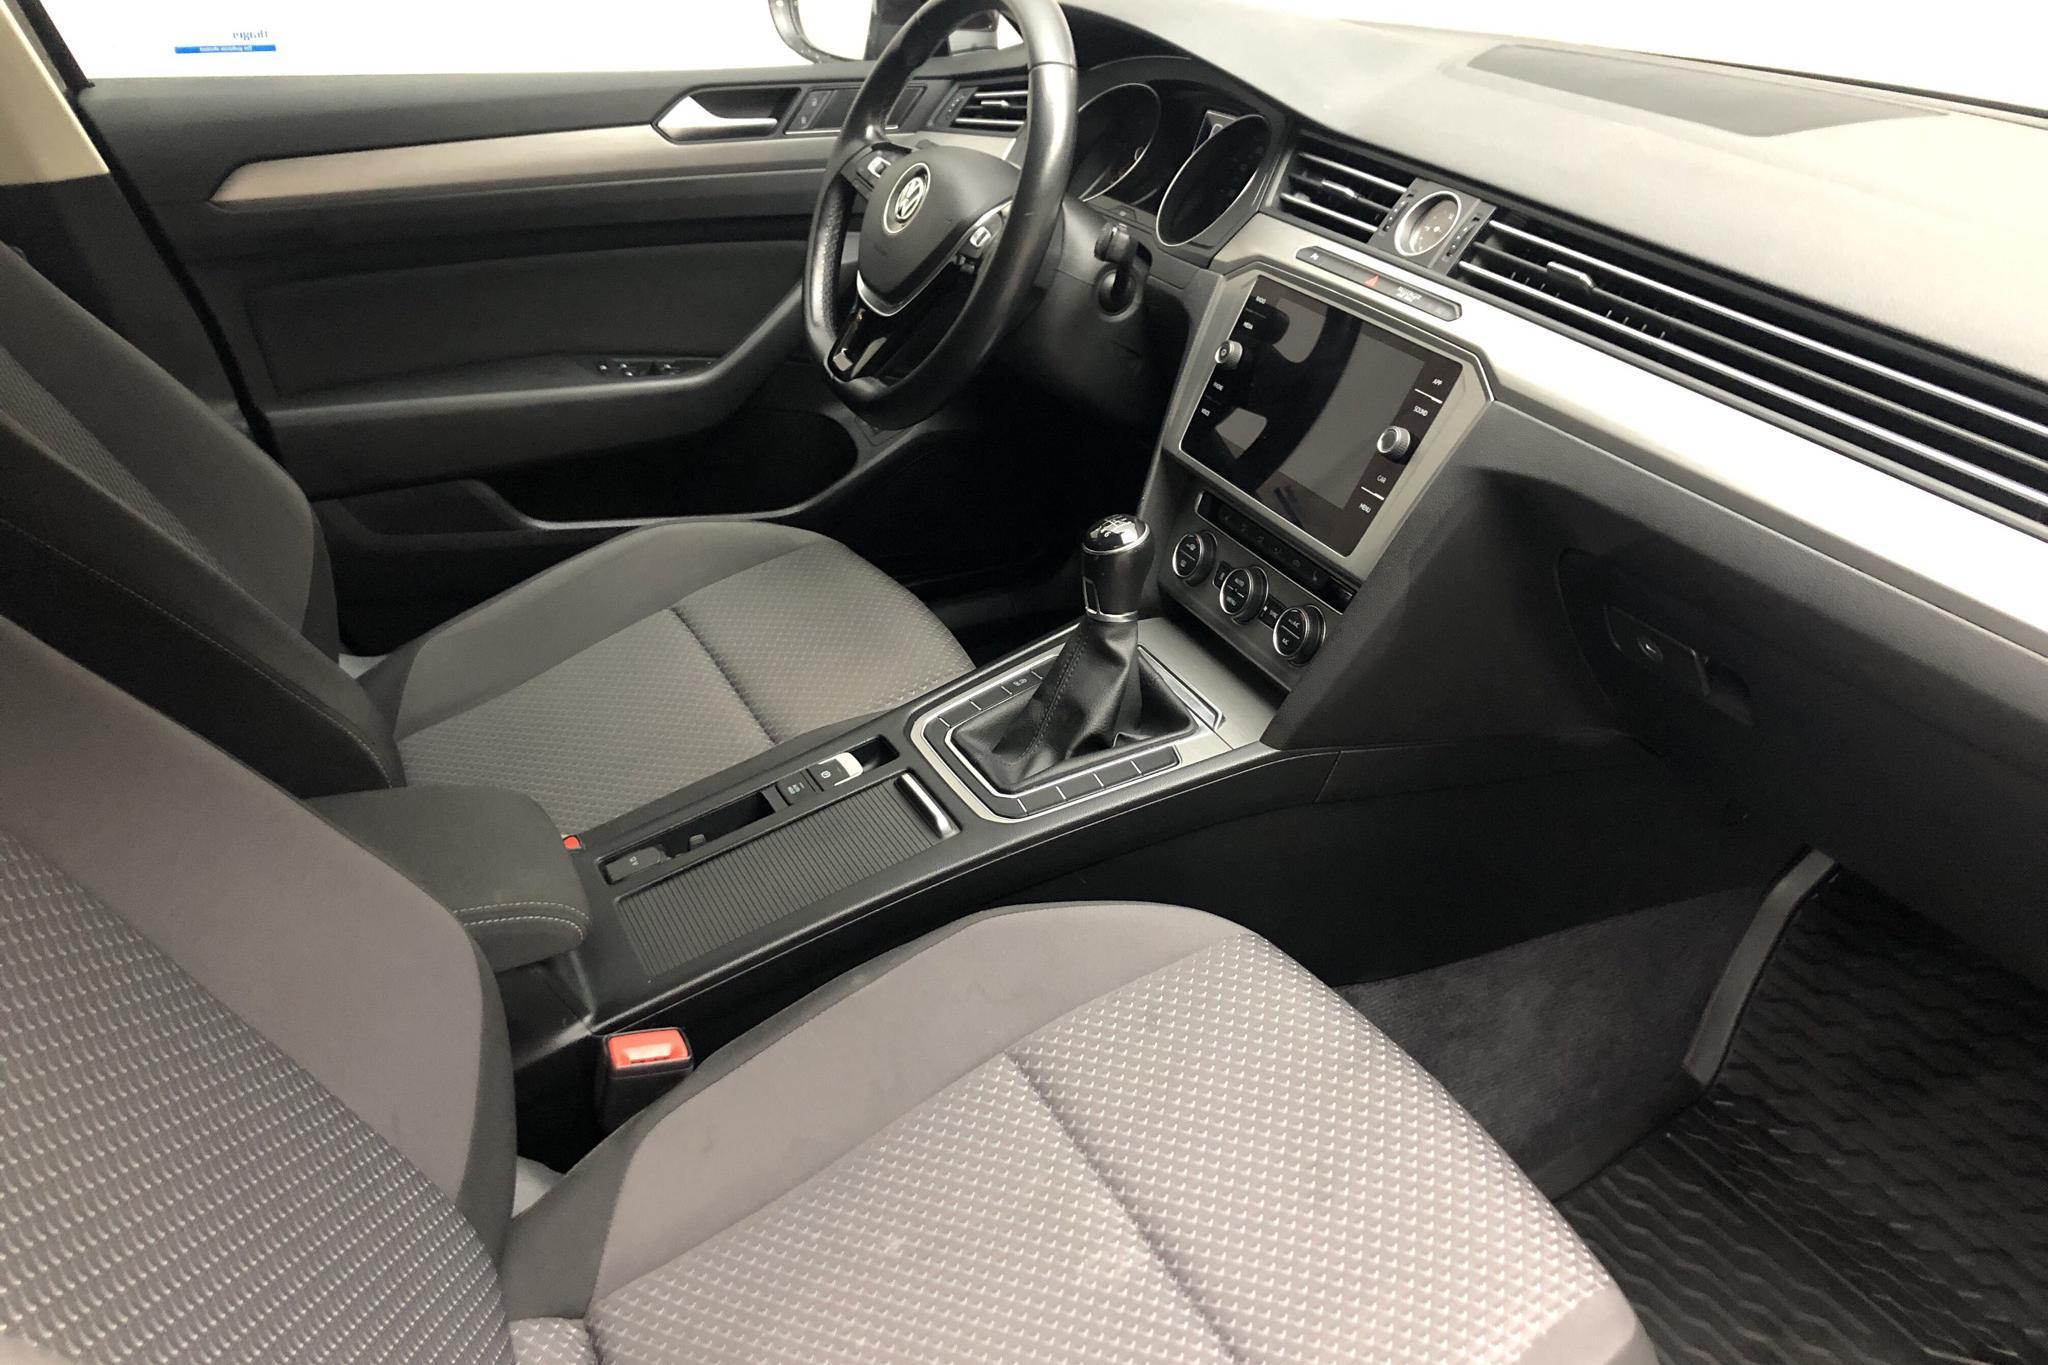 VW Passat 1.6 TDI Sportscombi (120hk) - 107 630 km - Manual - Dark Red - 2018